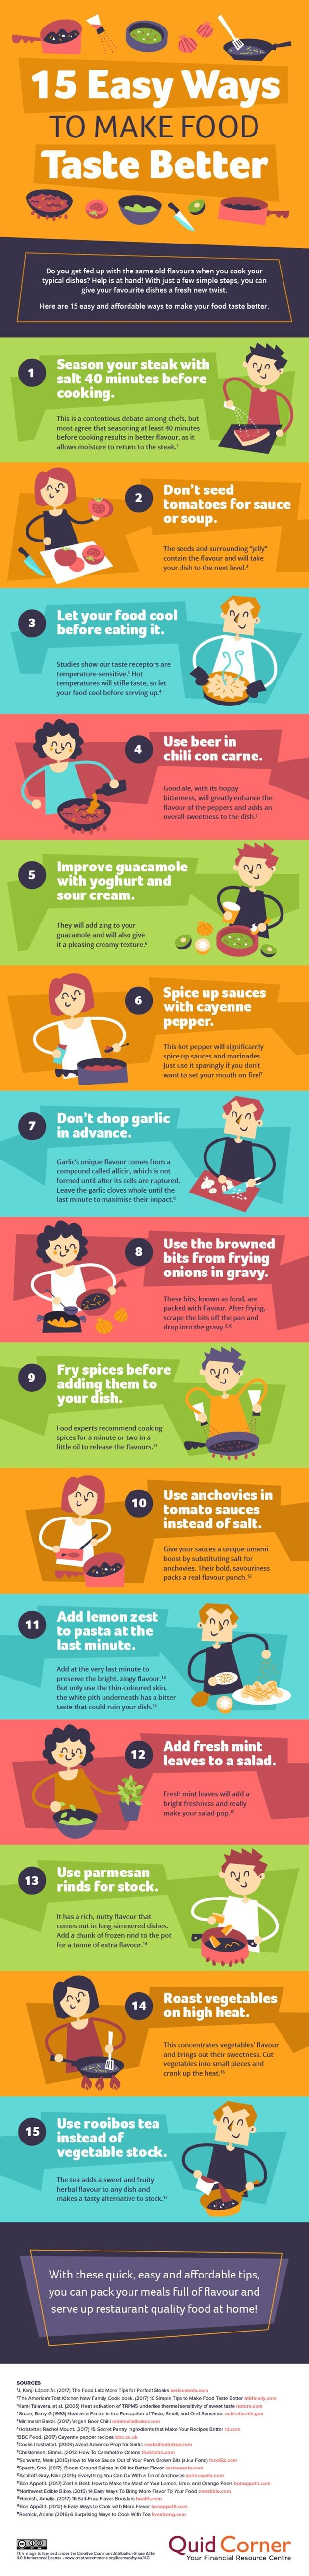 15 Easy Ways To Make Food Taste